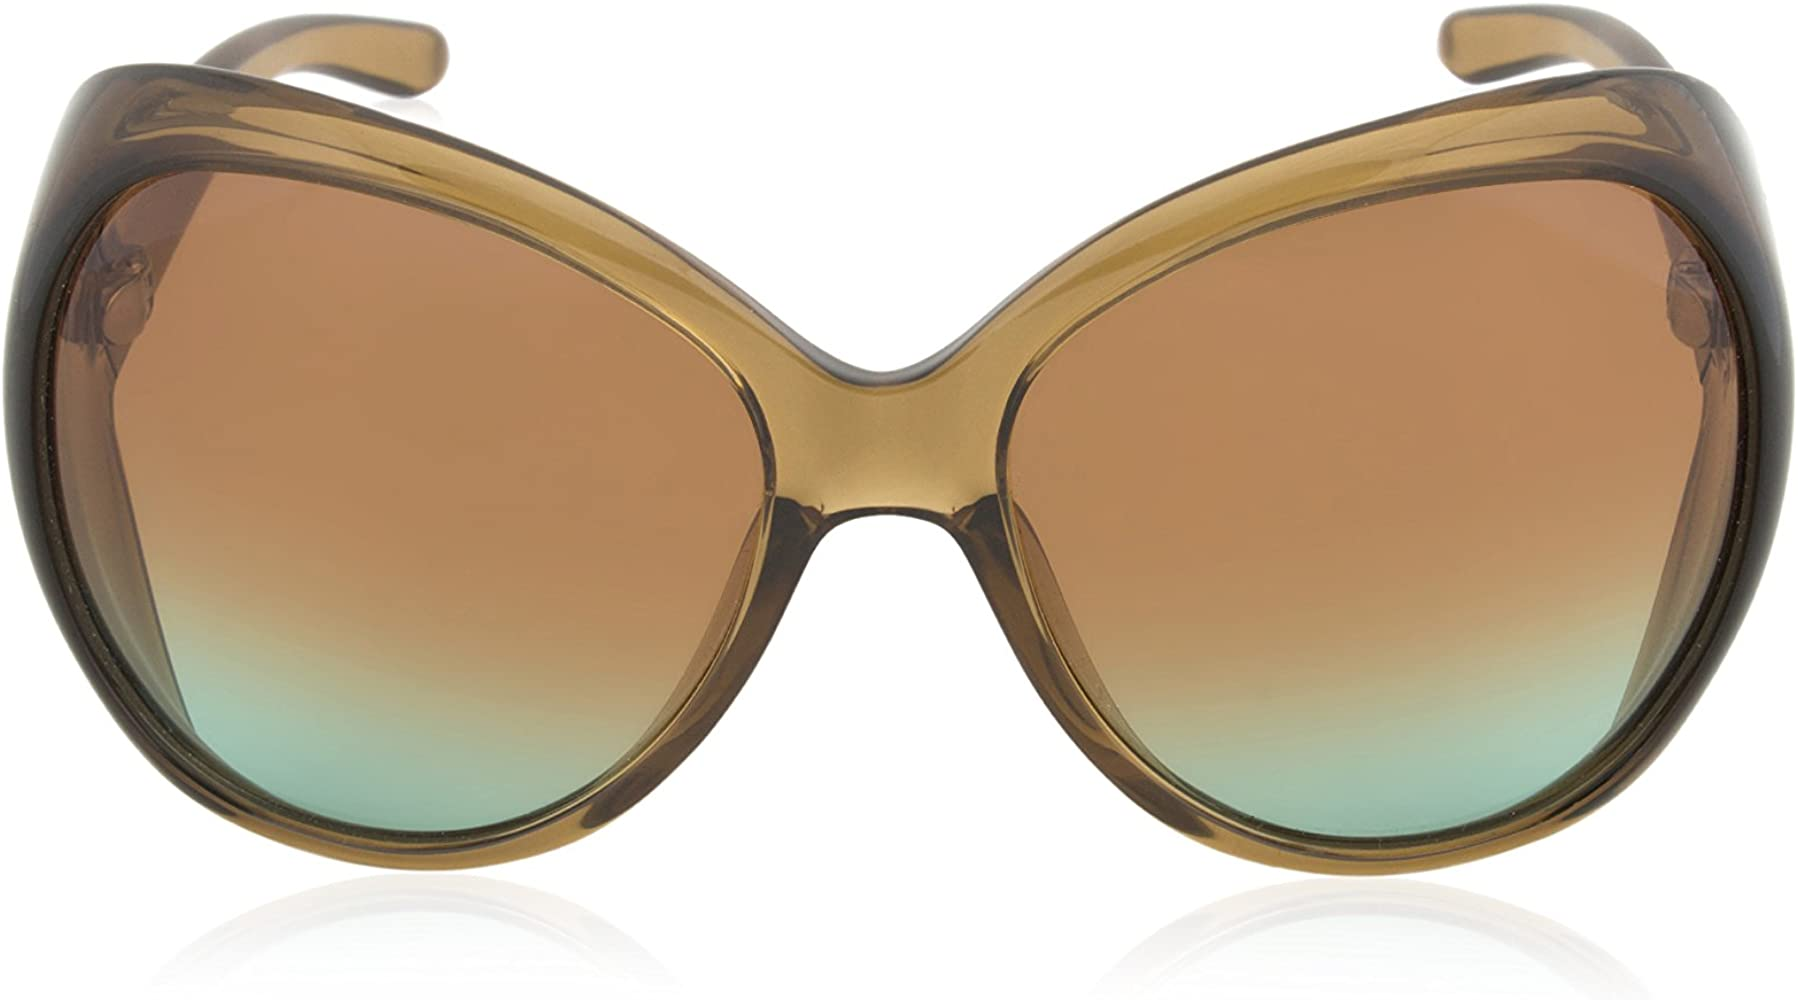 Amazon.com: Yves Saint Laurent anteojos de sol Womens ...